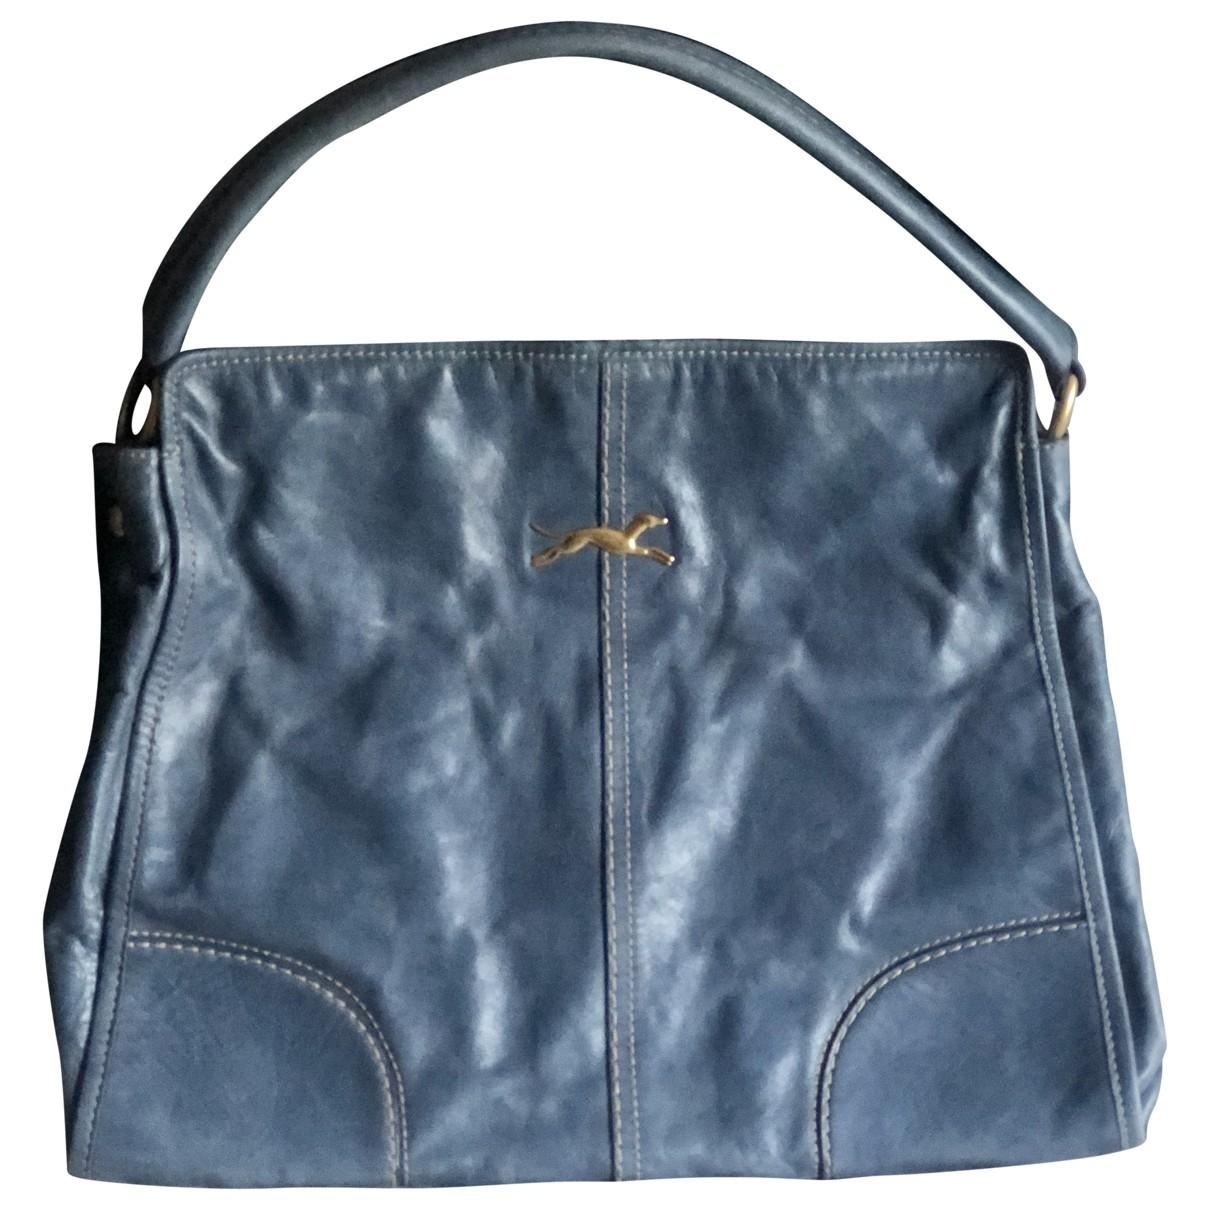 Bimba Y Lola \N Handtasche in  Blau Fell